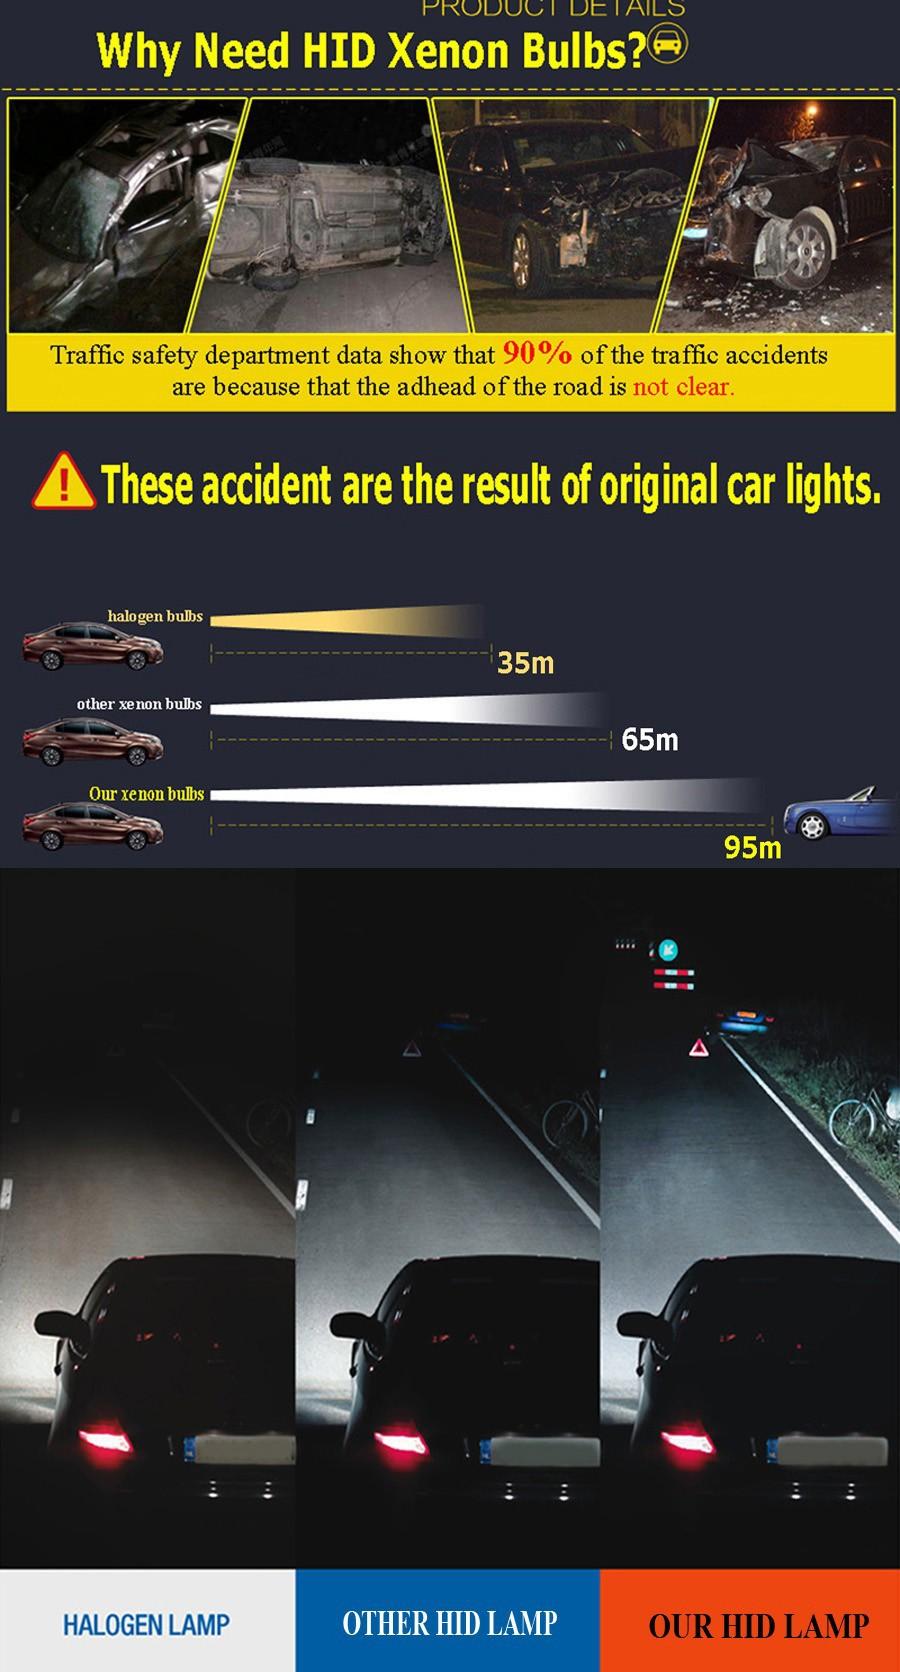 1-why need xenon bulbs